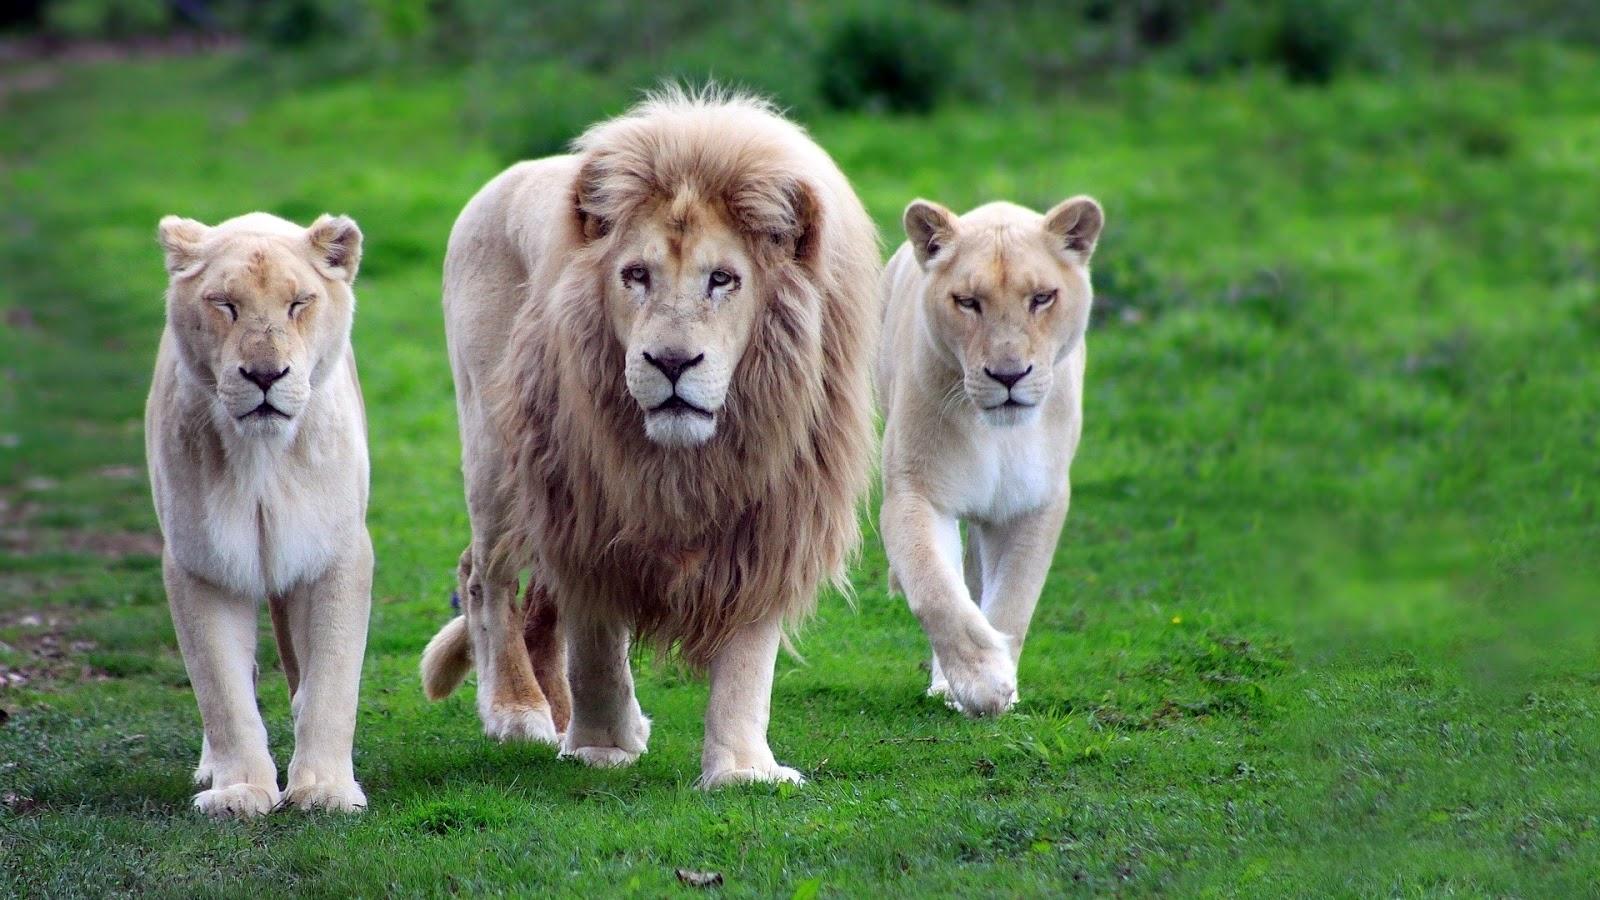 Online Wallpapers Shop: Lion Pictures, Images & Wallpaper